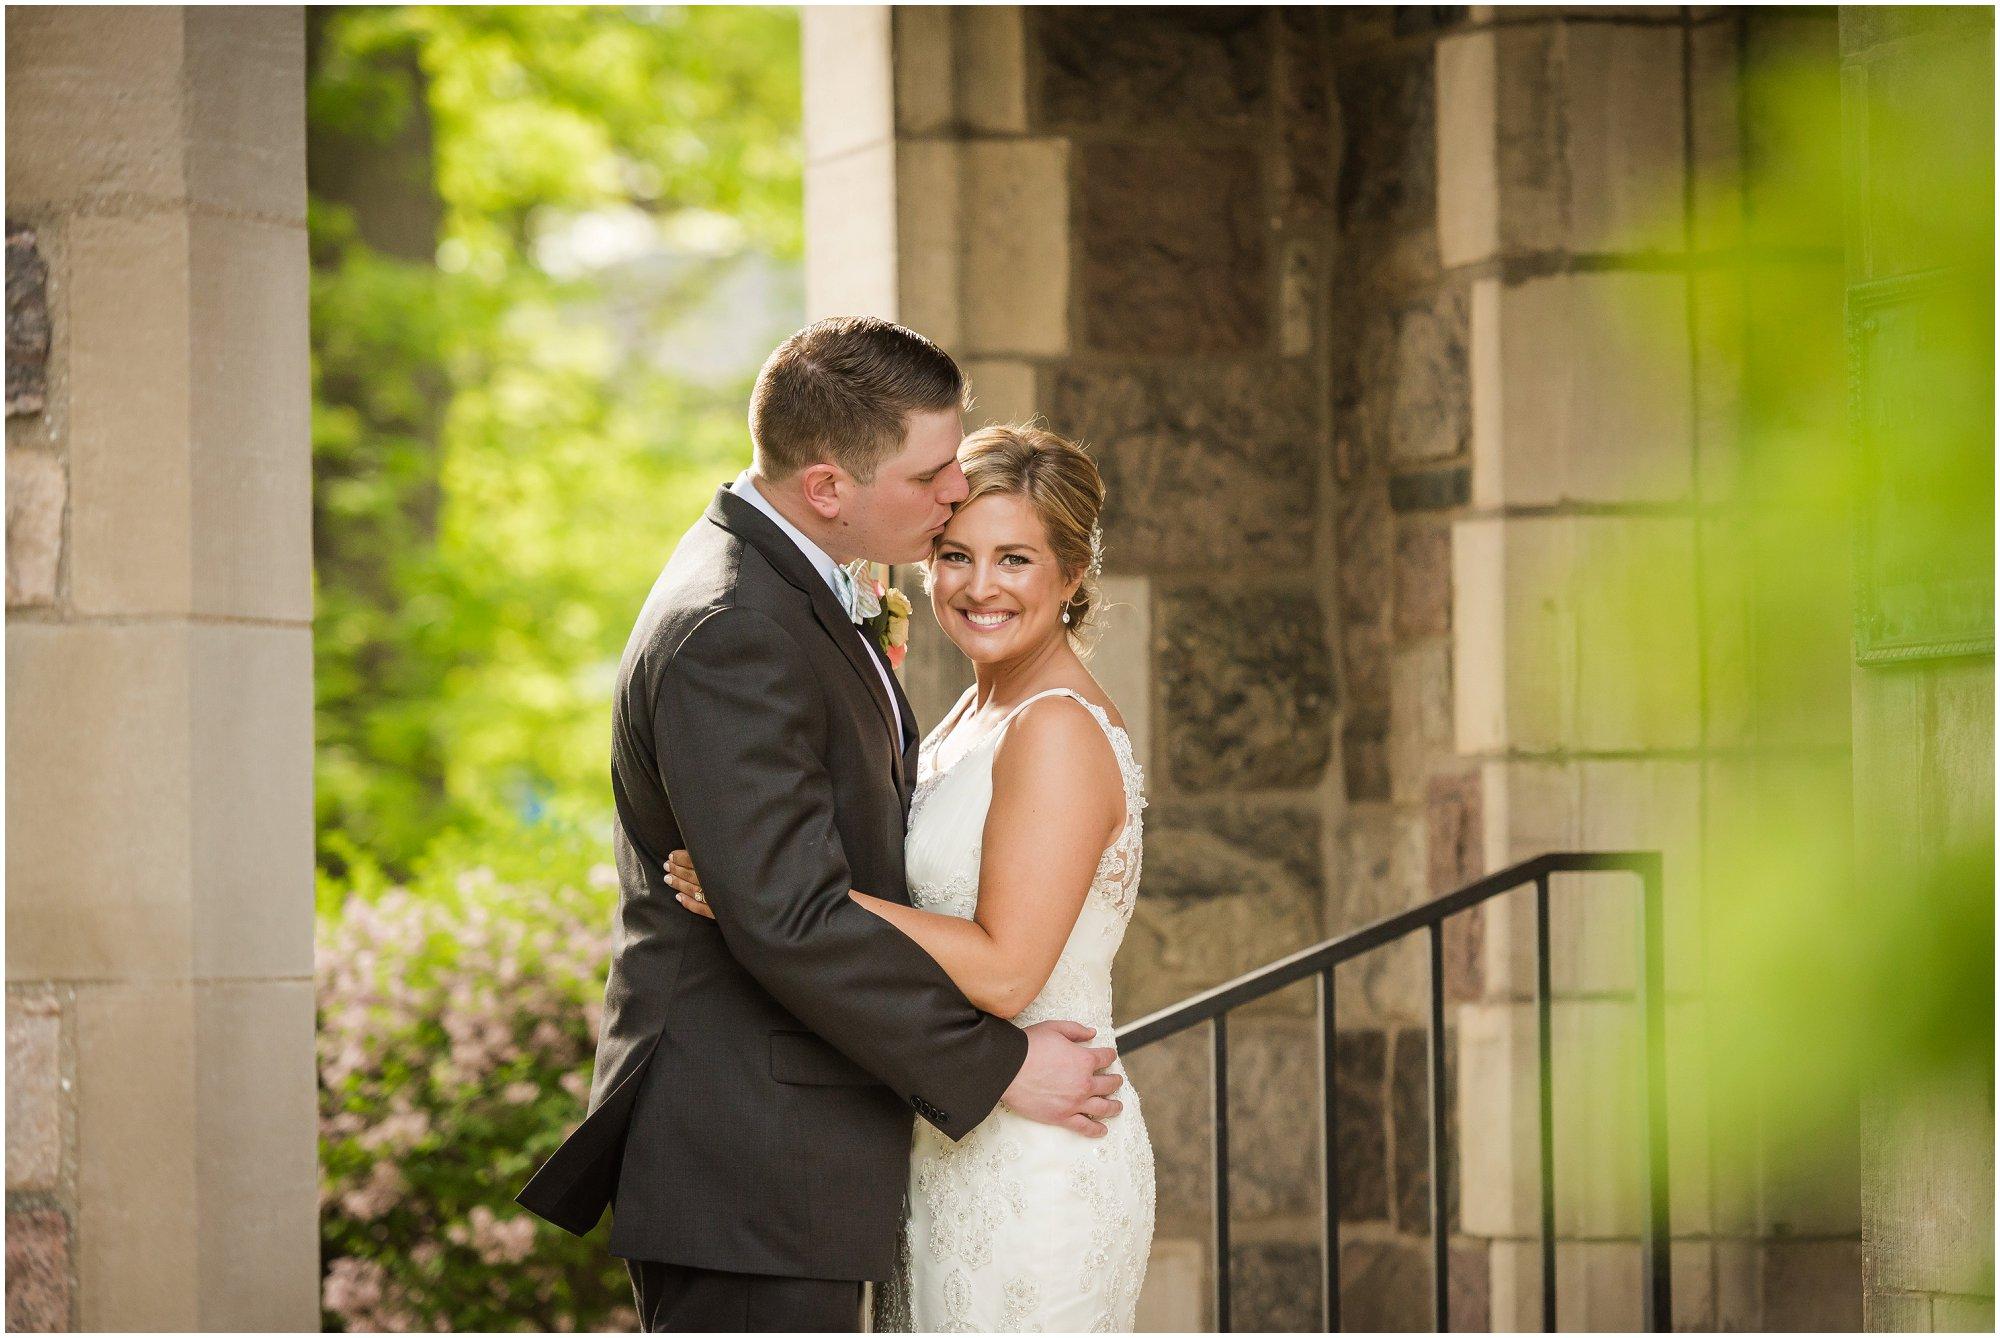 Plymouth_michigan_wedding_photographer_0423.jpg